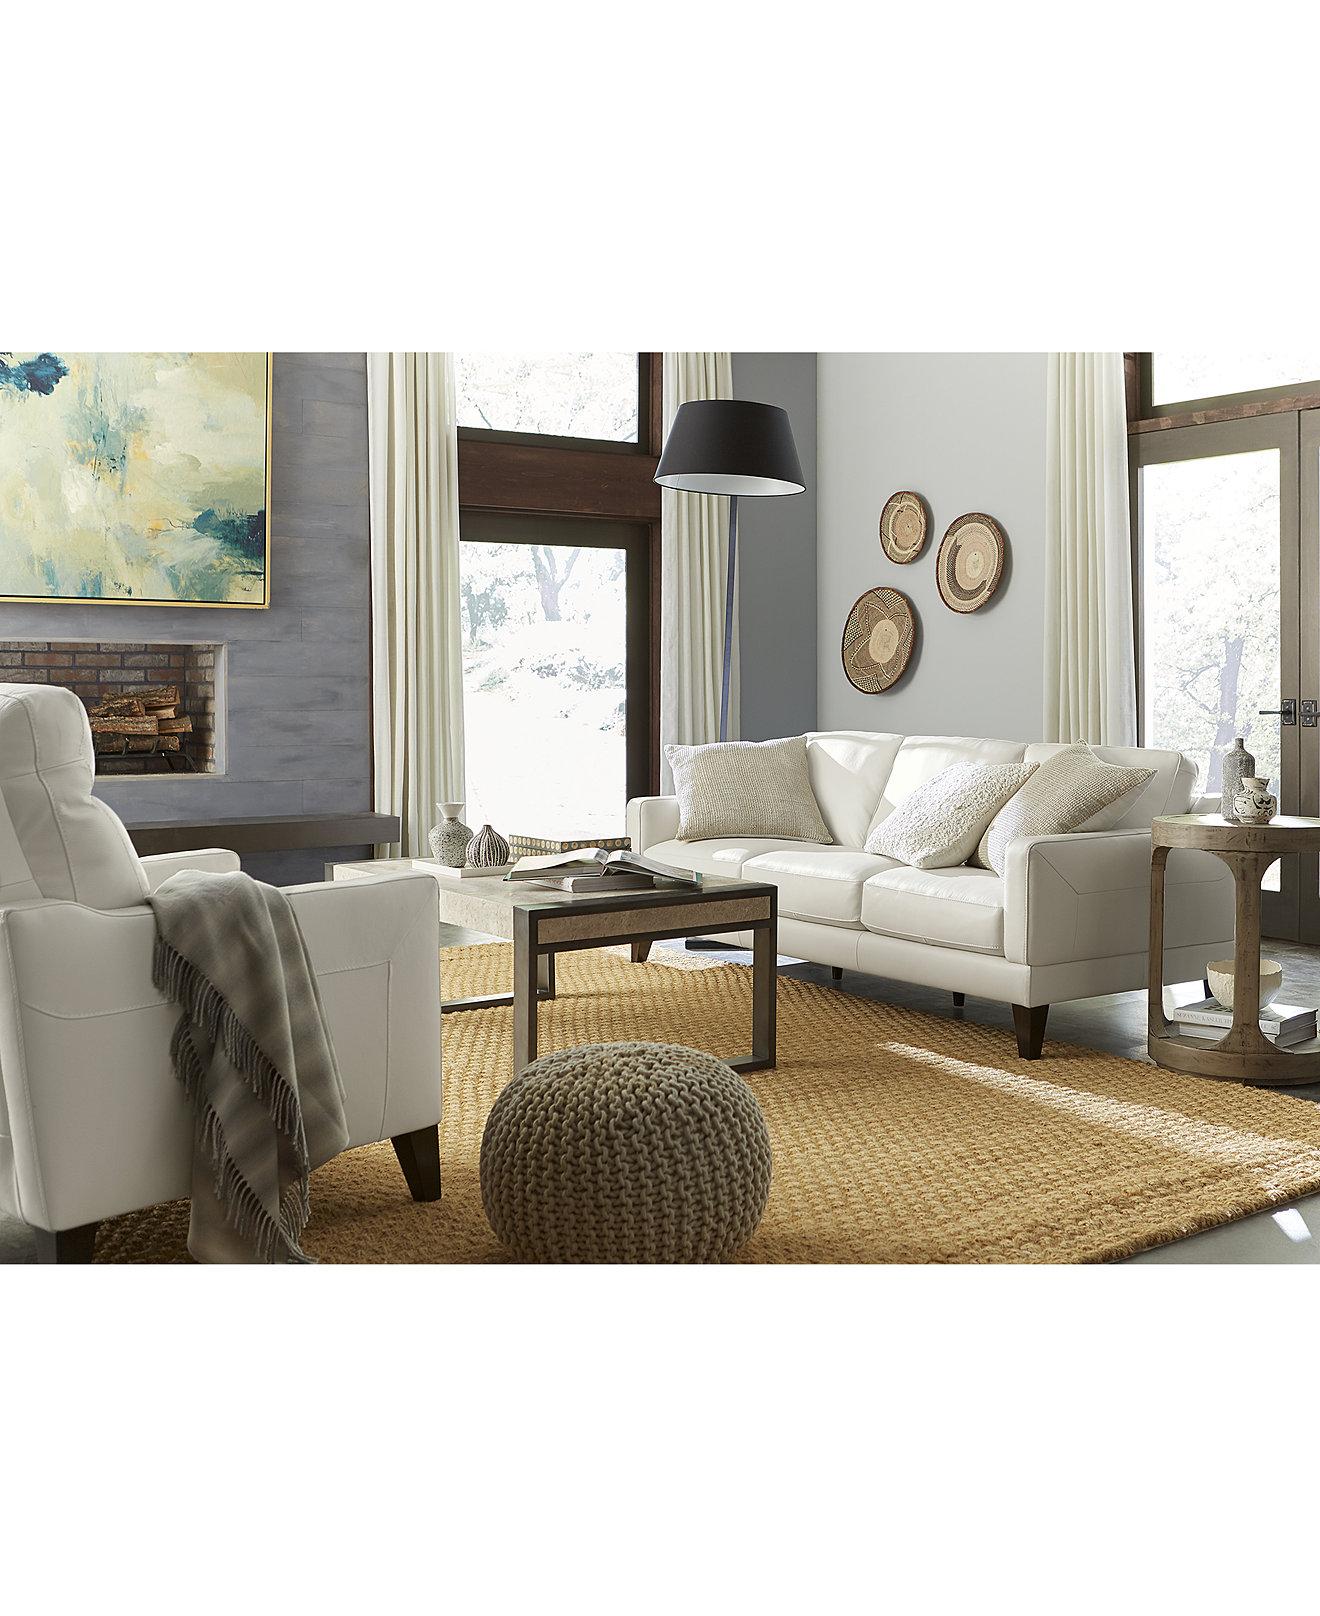 Emilda leather sofa collection